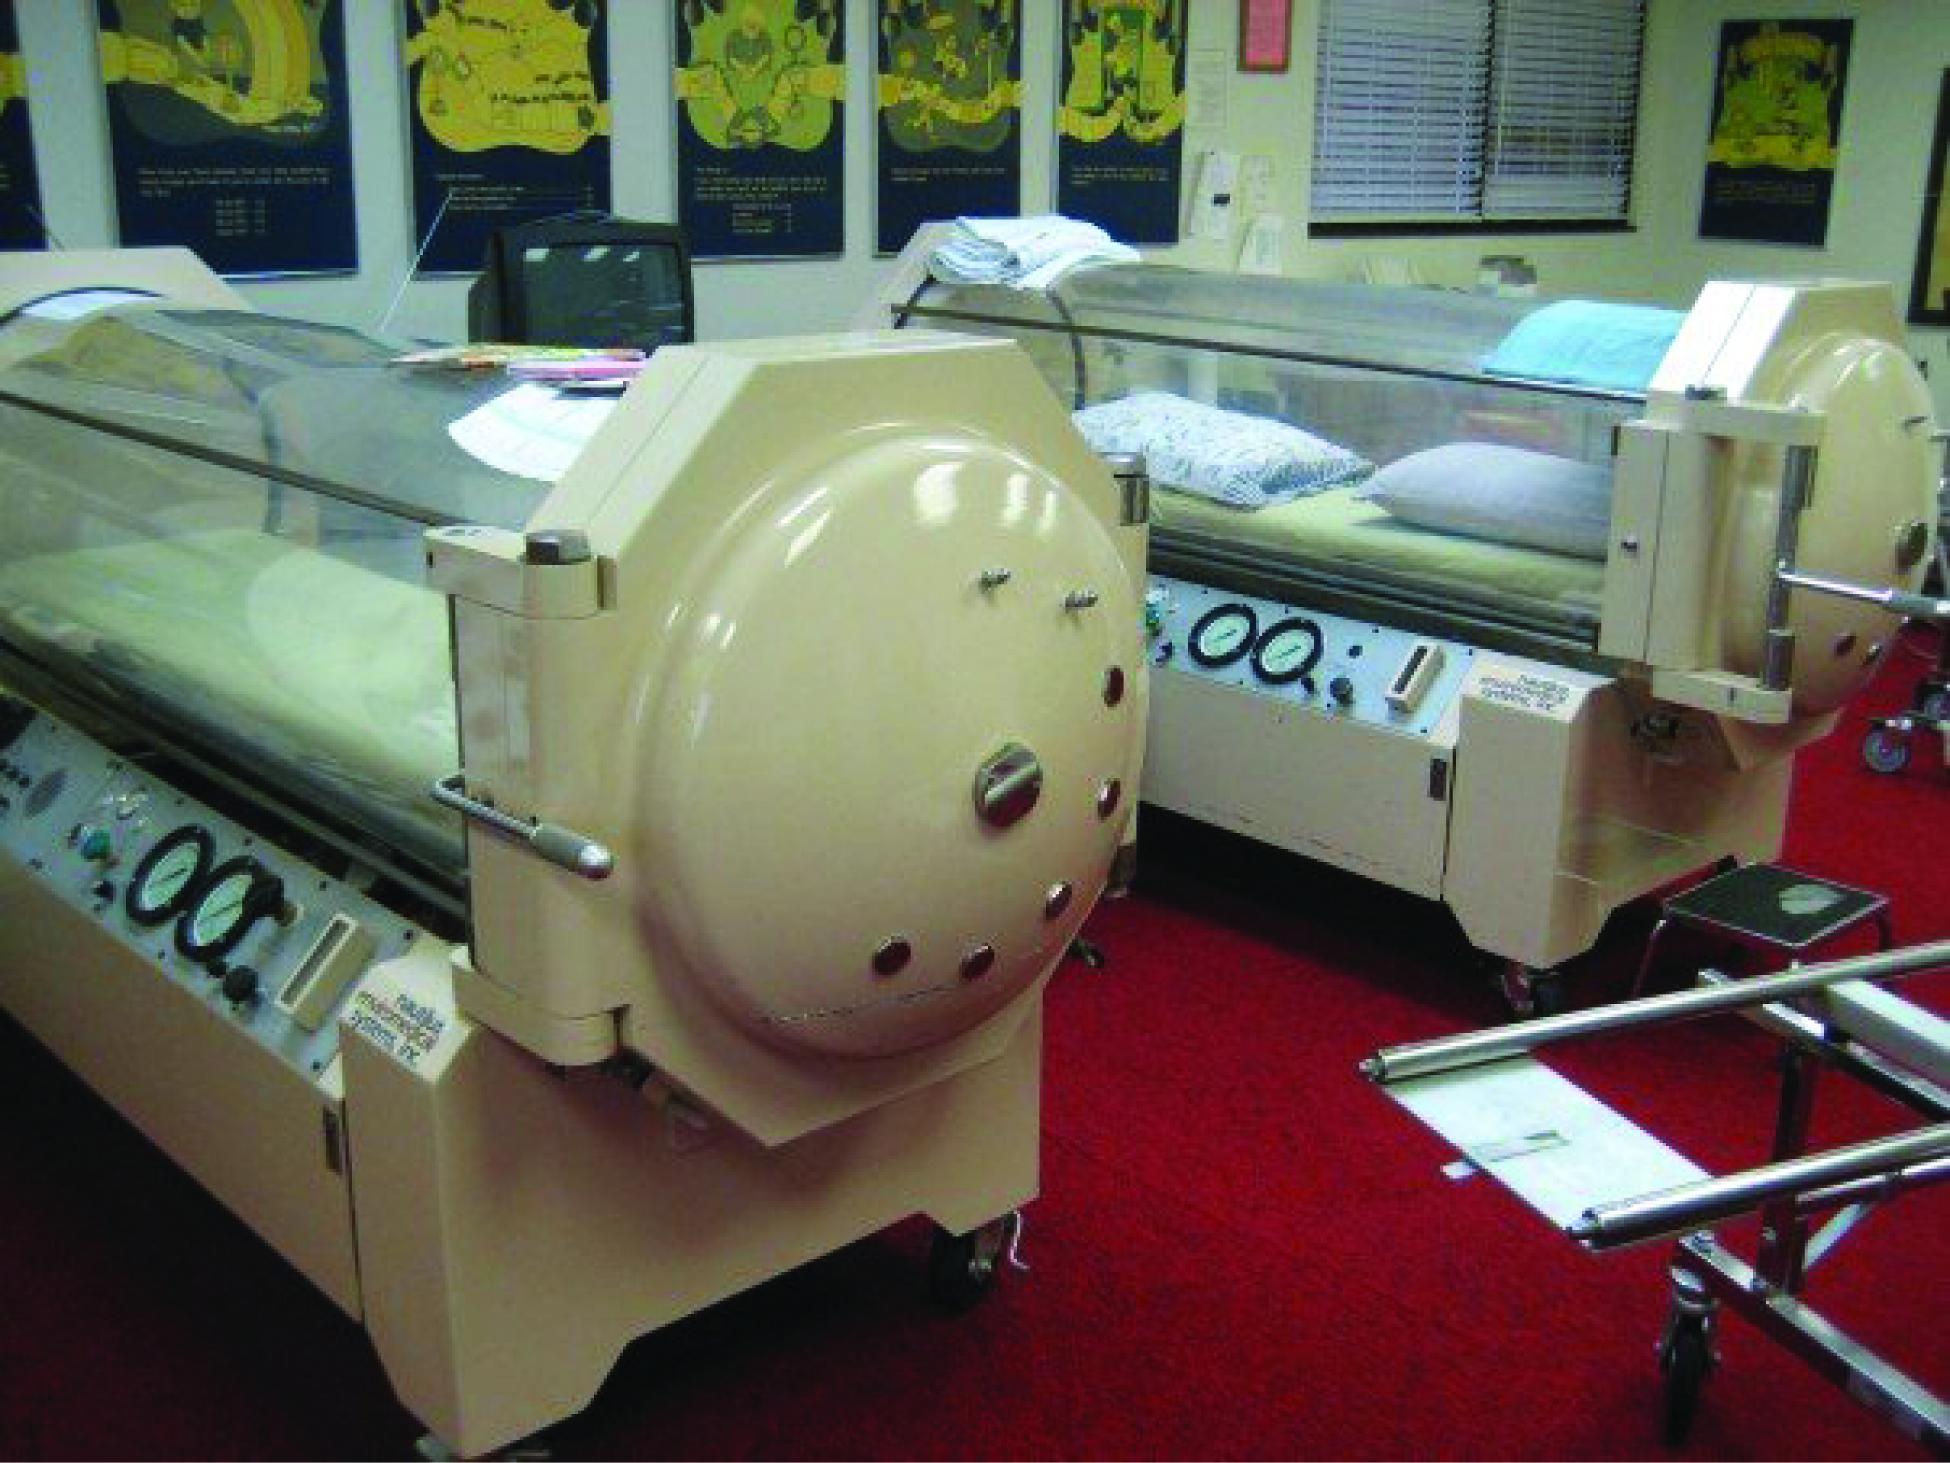 File:2332 Hyperbaric Chamber jpg - Wikimedia Commons